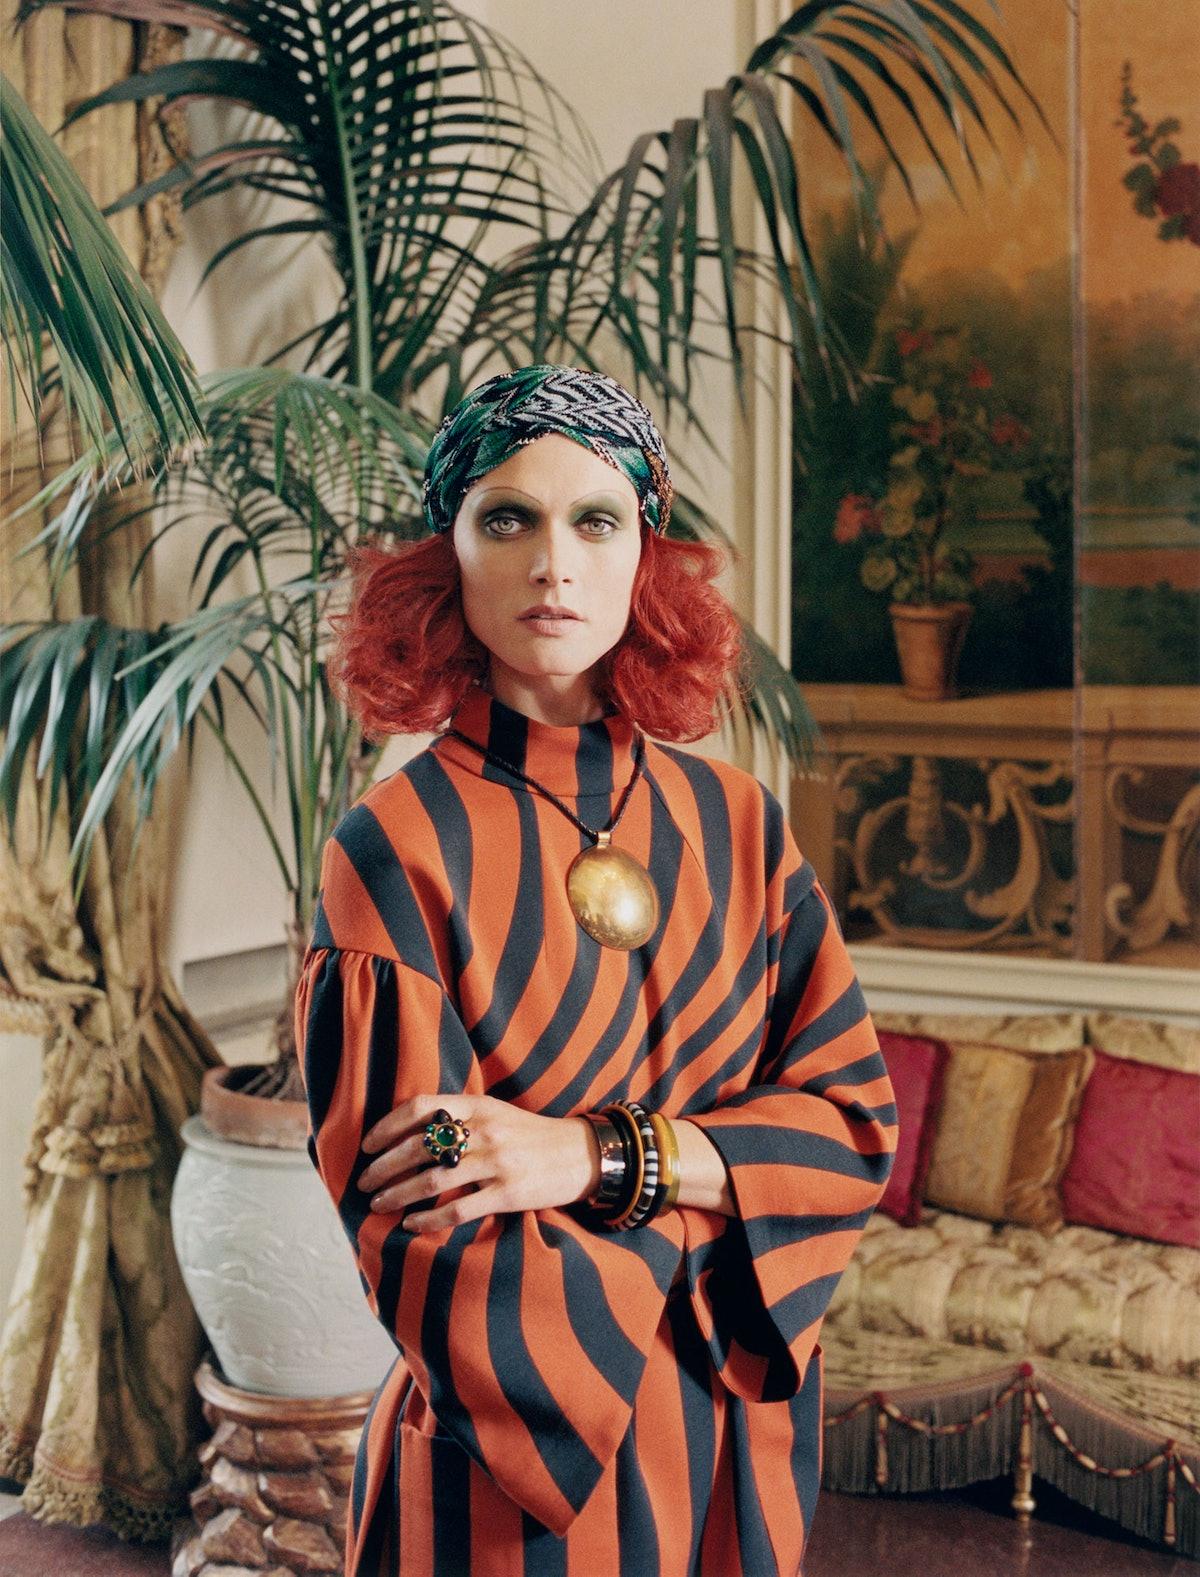 dries-van-noten-dress-venetian-princess.jpg